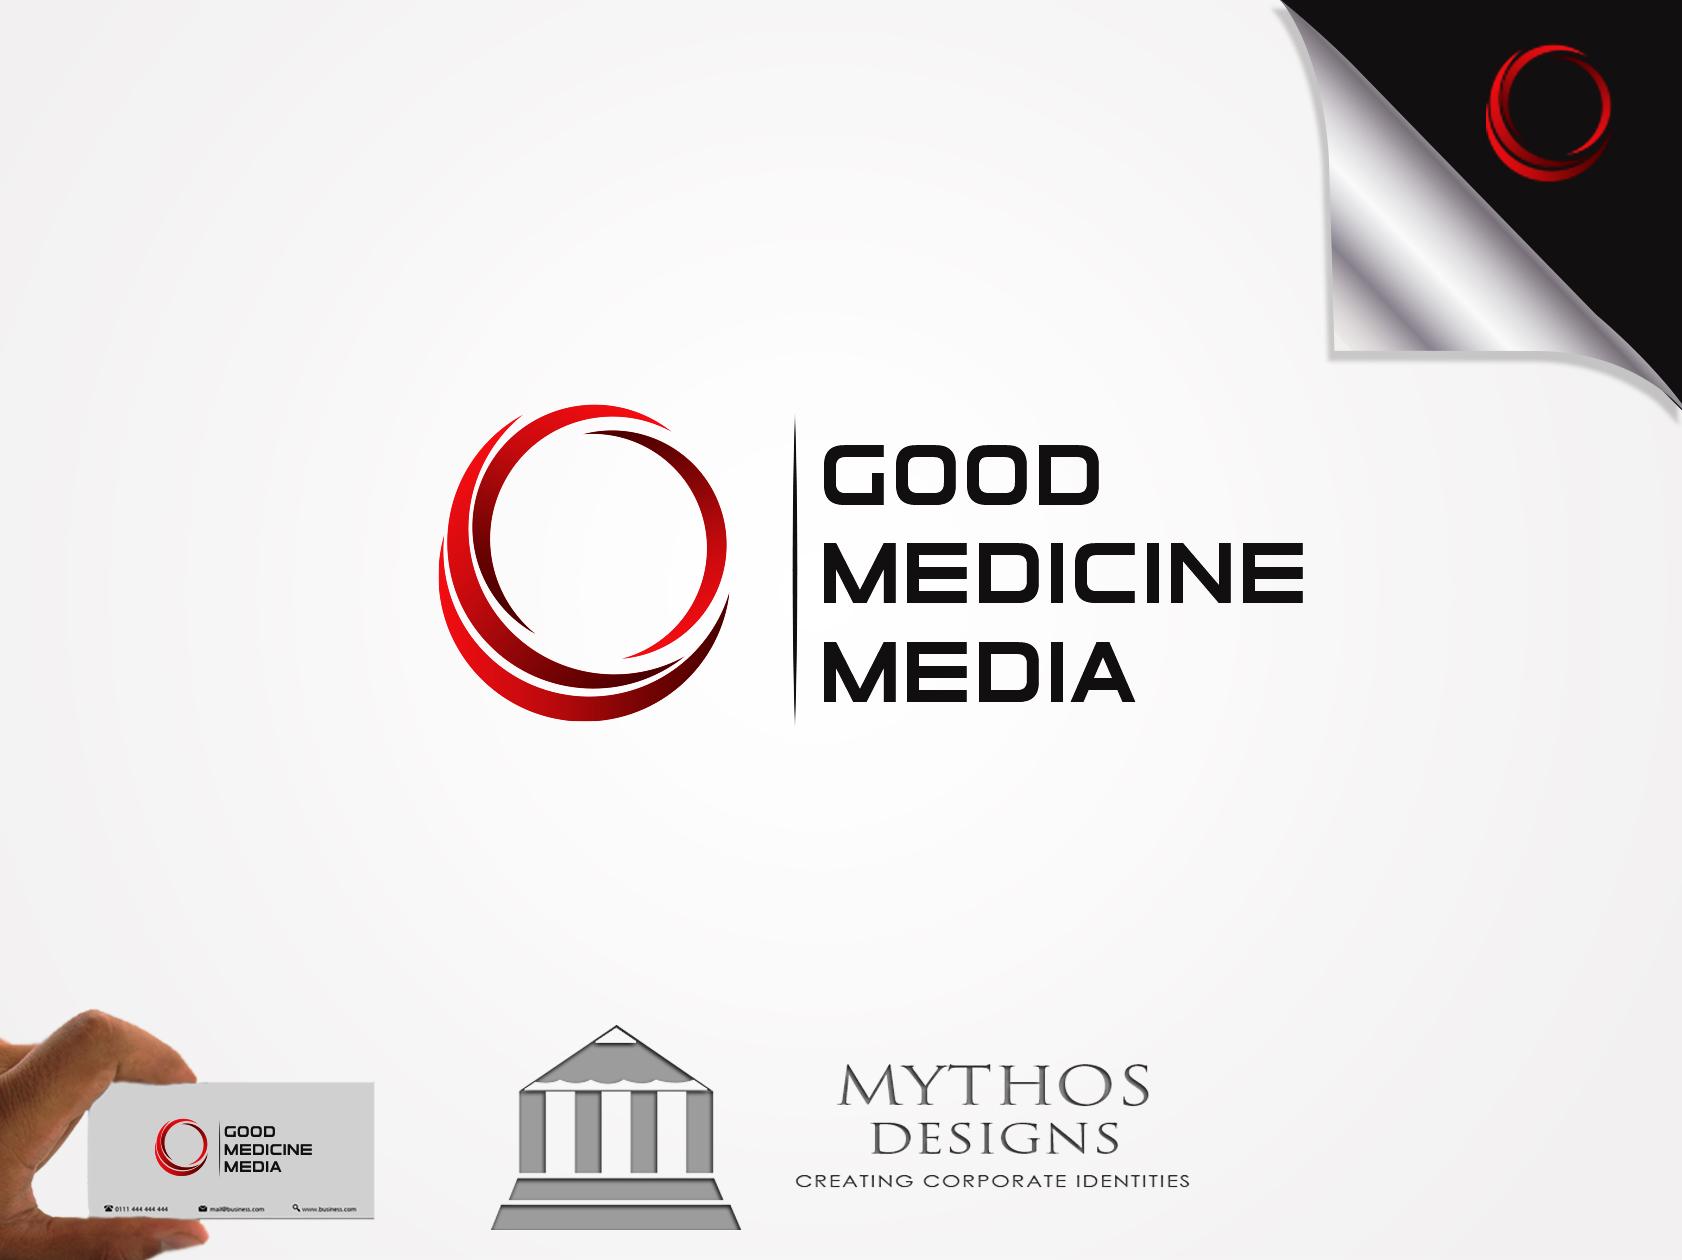 Logo Design by Mythos Designs - Entry No. 4 in the Logo Design Contest Good Medicine Media Logo Design.